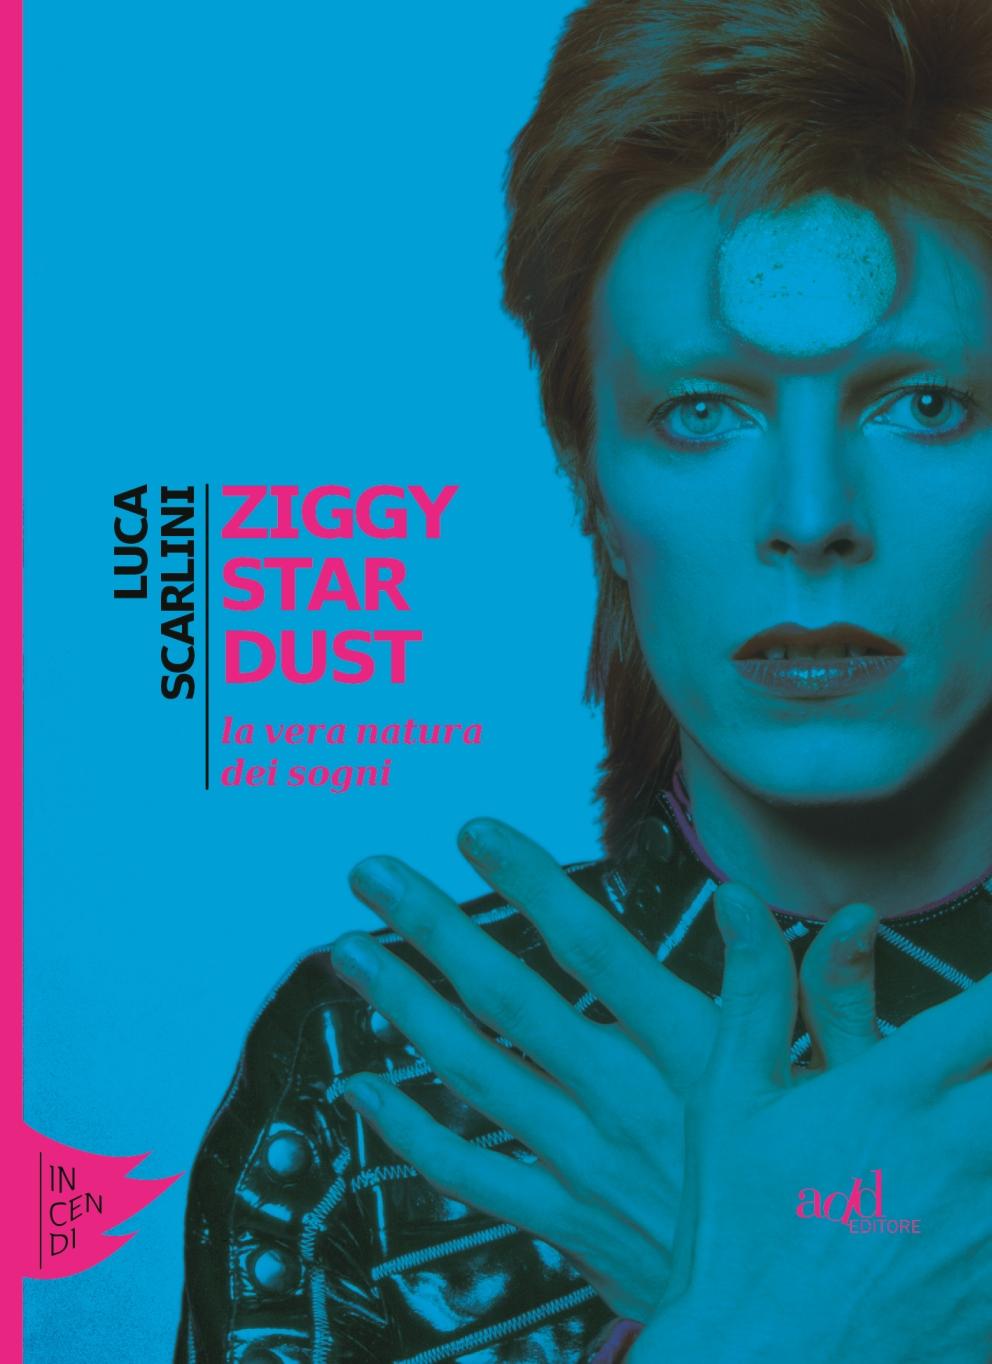 Luca Scarlini - Ziggy Star Dust